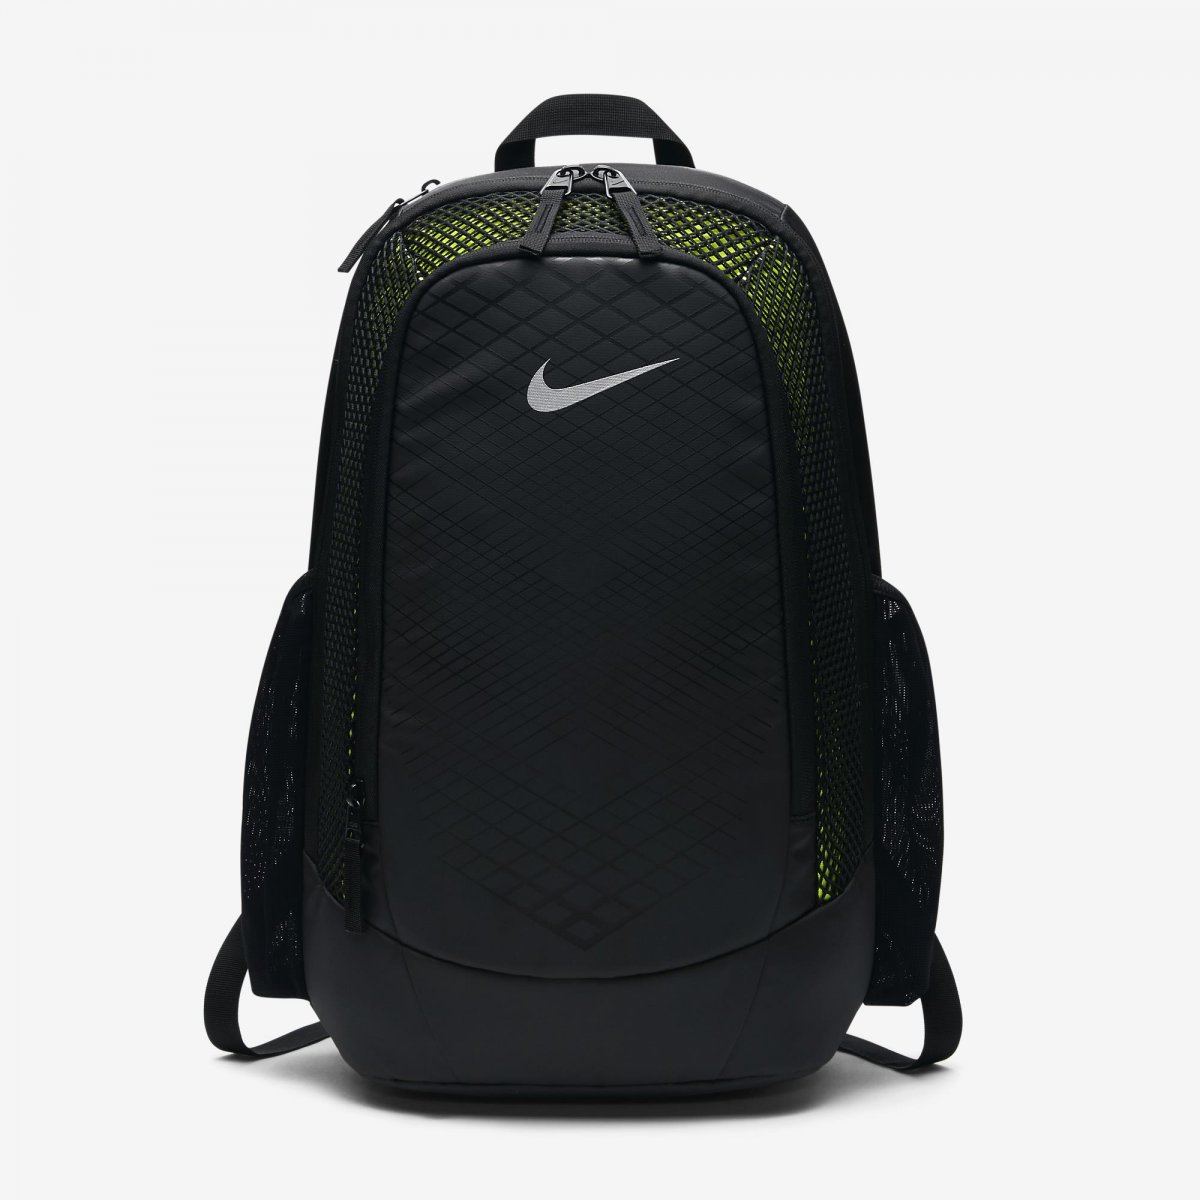 Bizz Store - Mochila Masculina Nike Vapor Speed Porta Notebook 40f79939a2b10